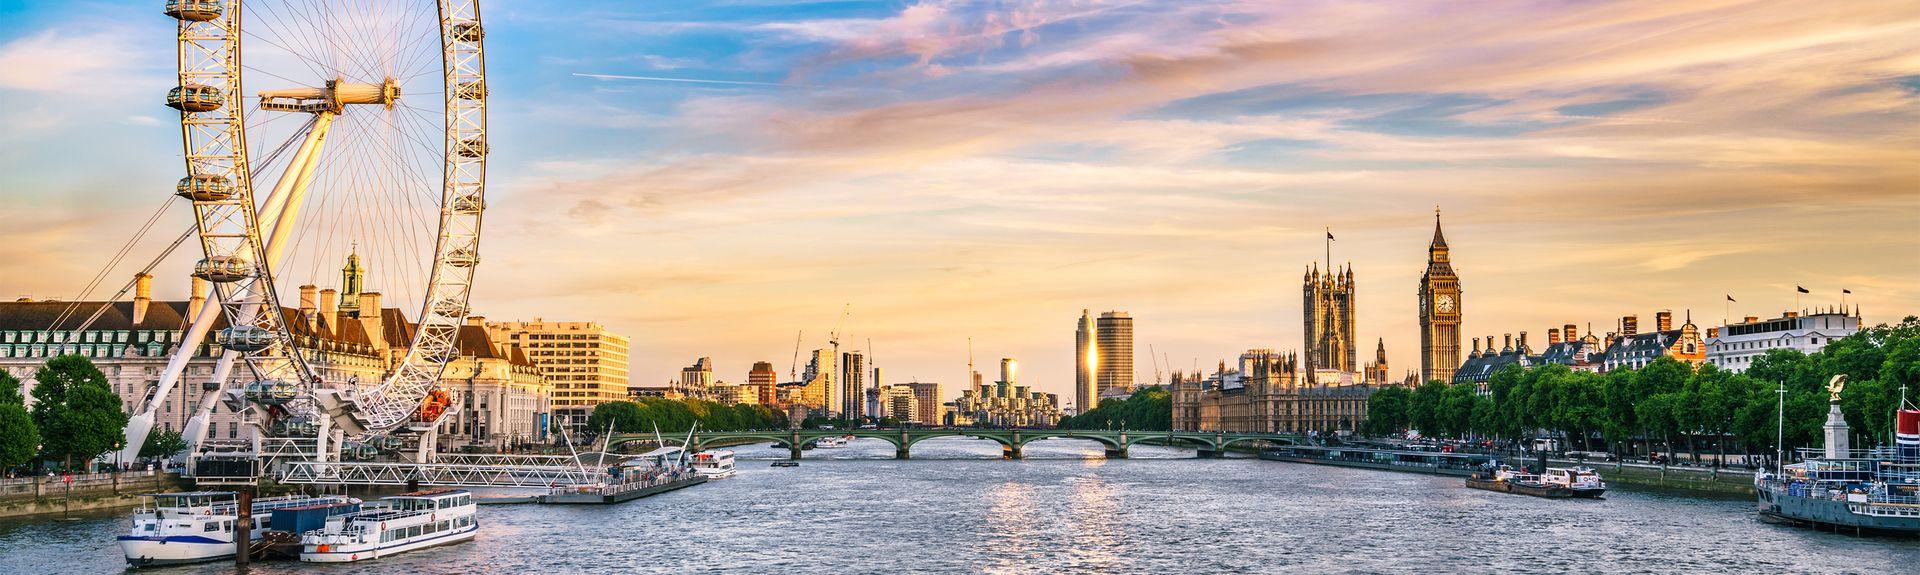 Bow East, Tower Hamlets, London, UK